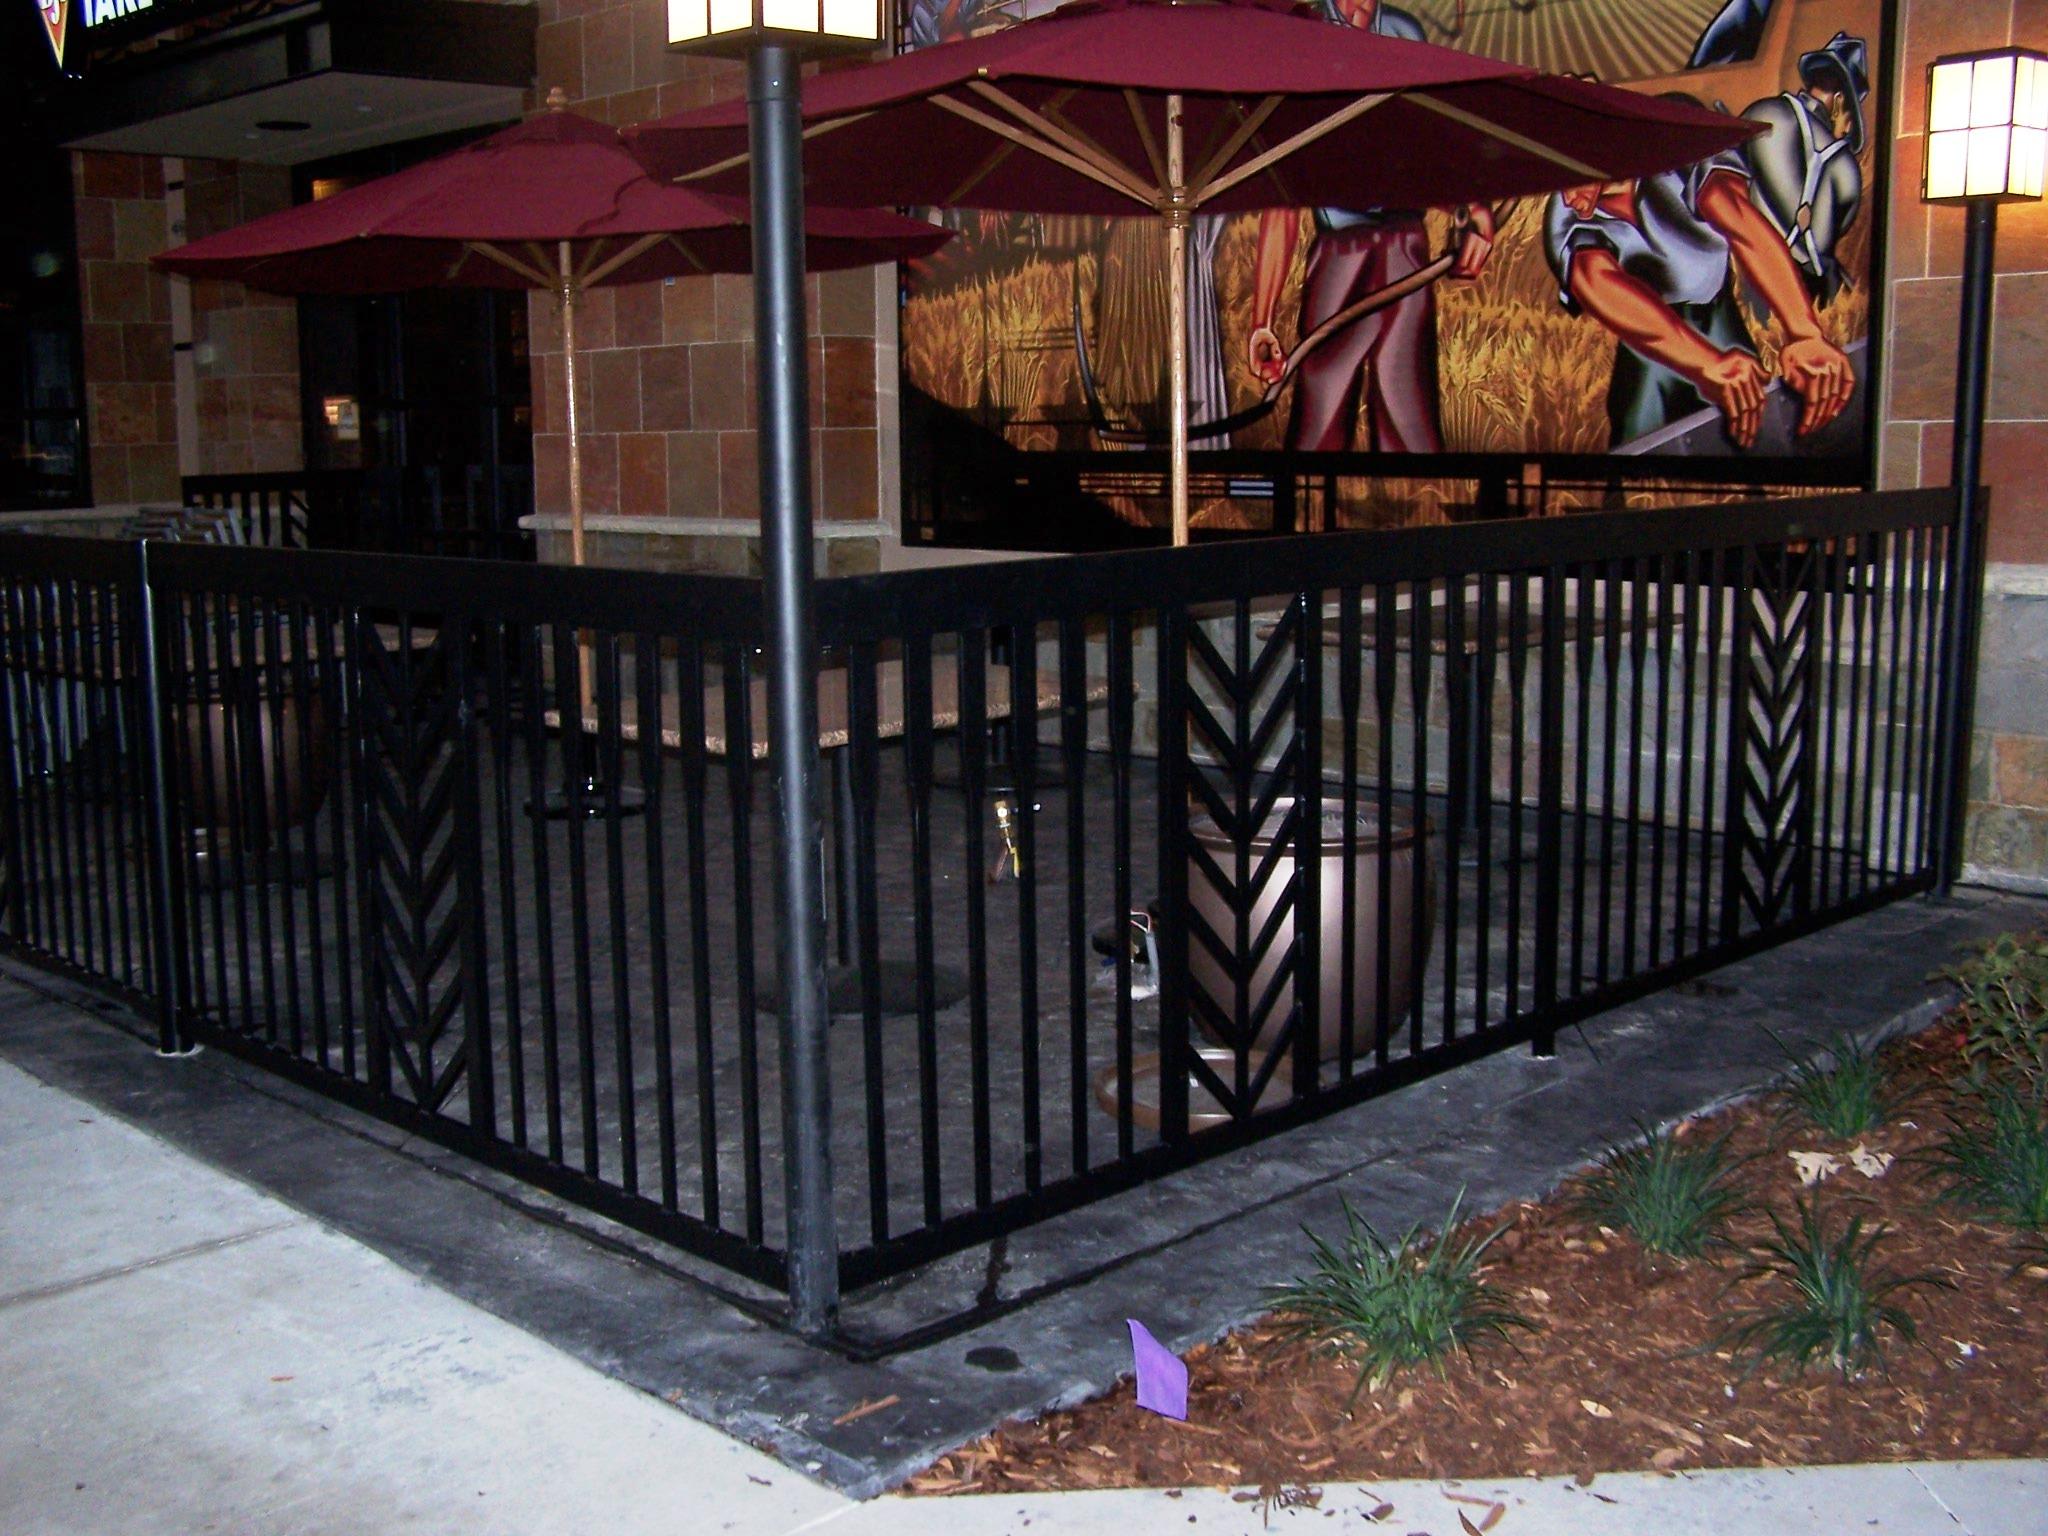 Commercial railing decorative art deco glass handicap fdot for Decorative railings